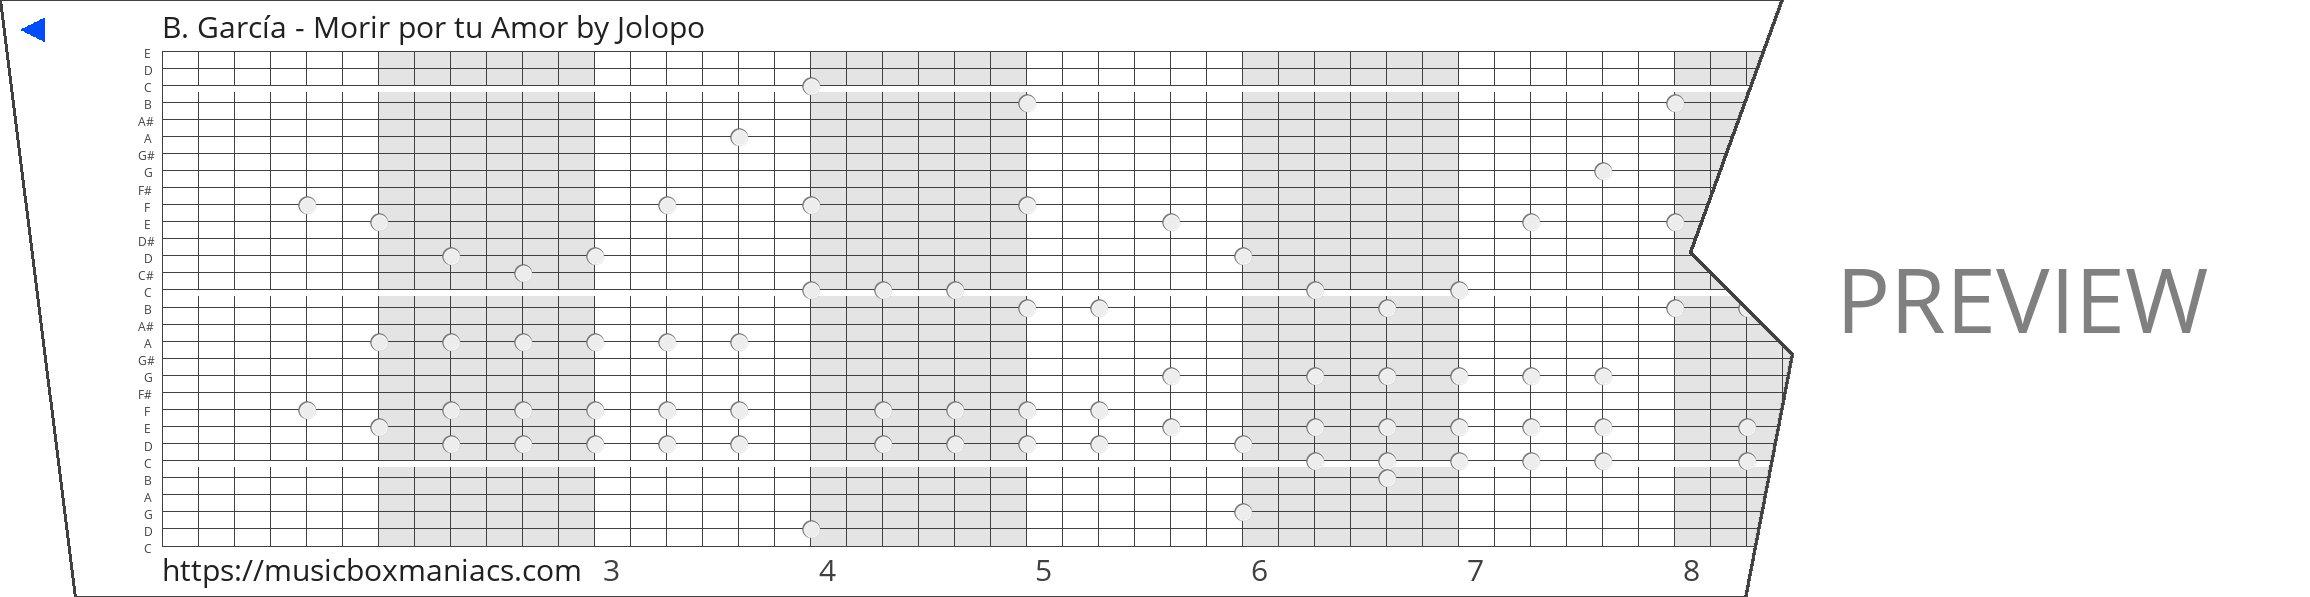 B. García - Morir por tu Amor 30 note music box paper strip